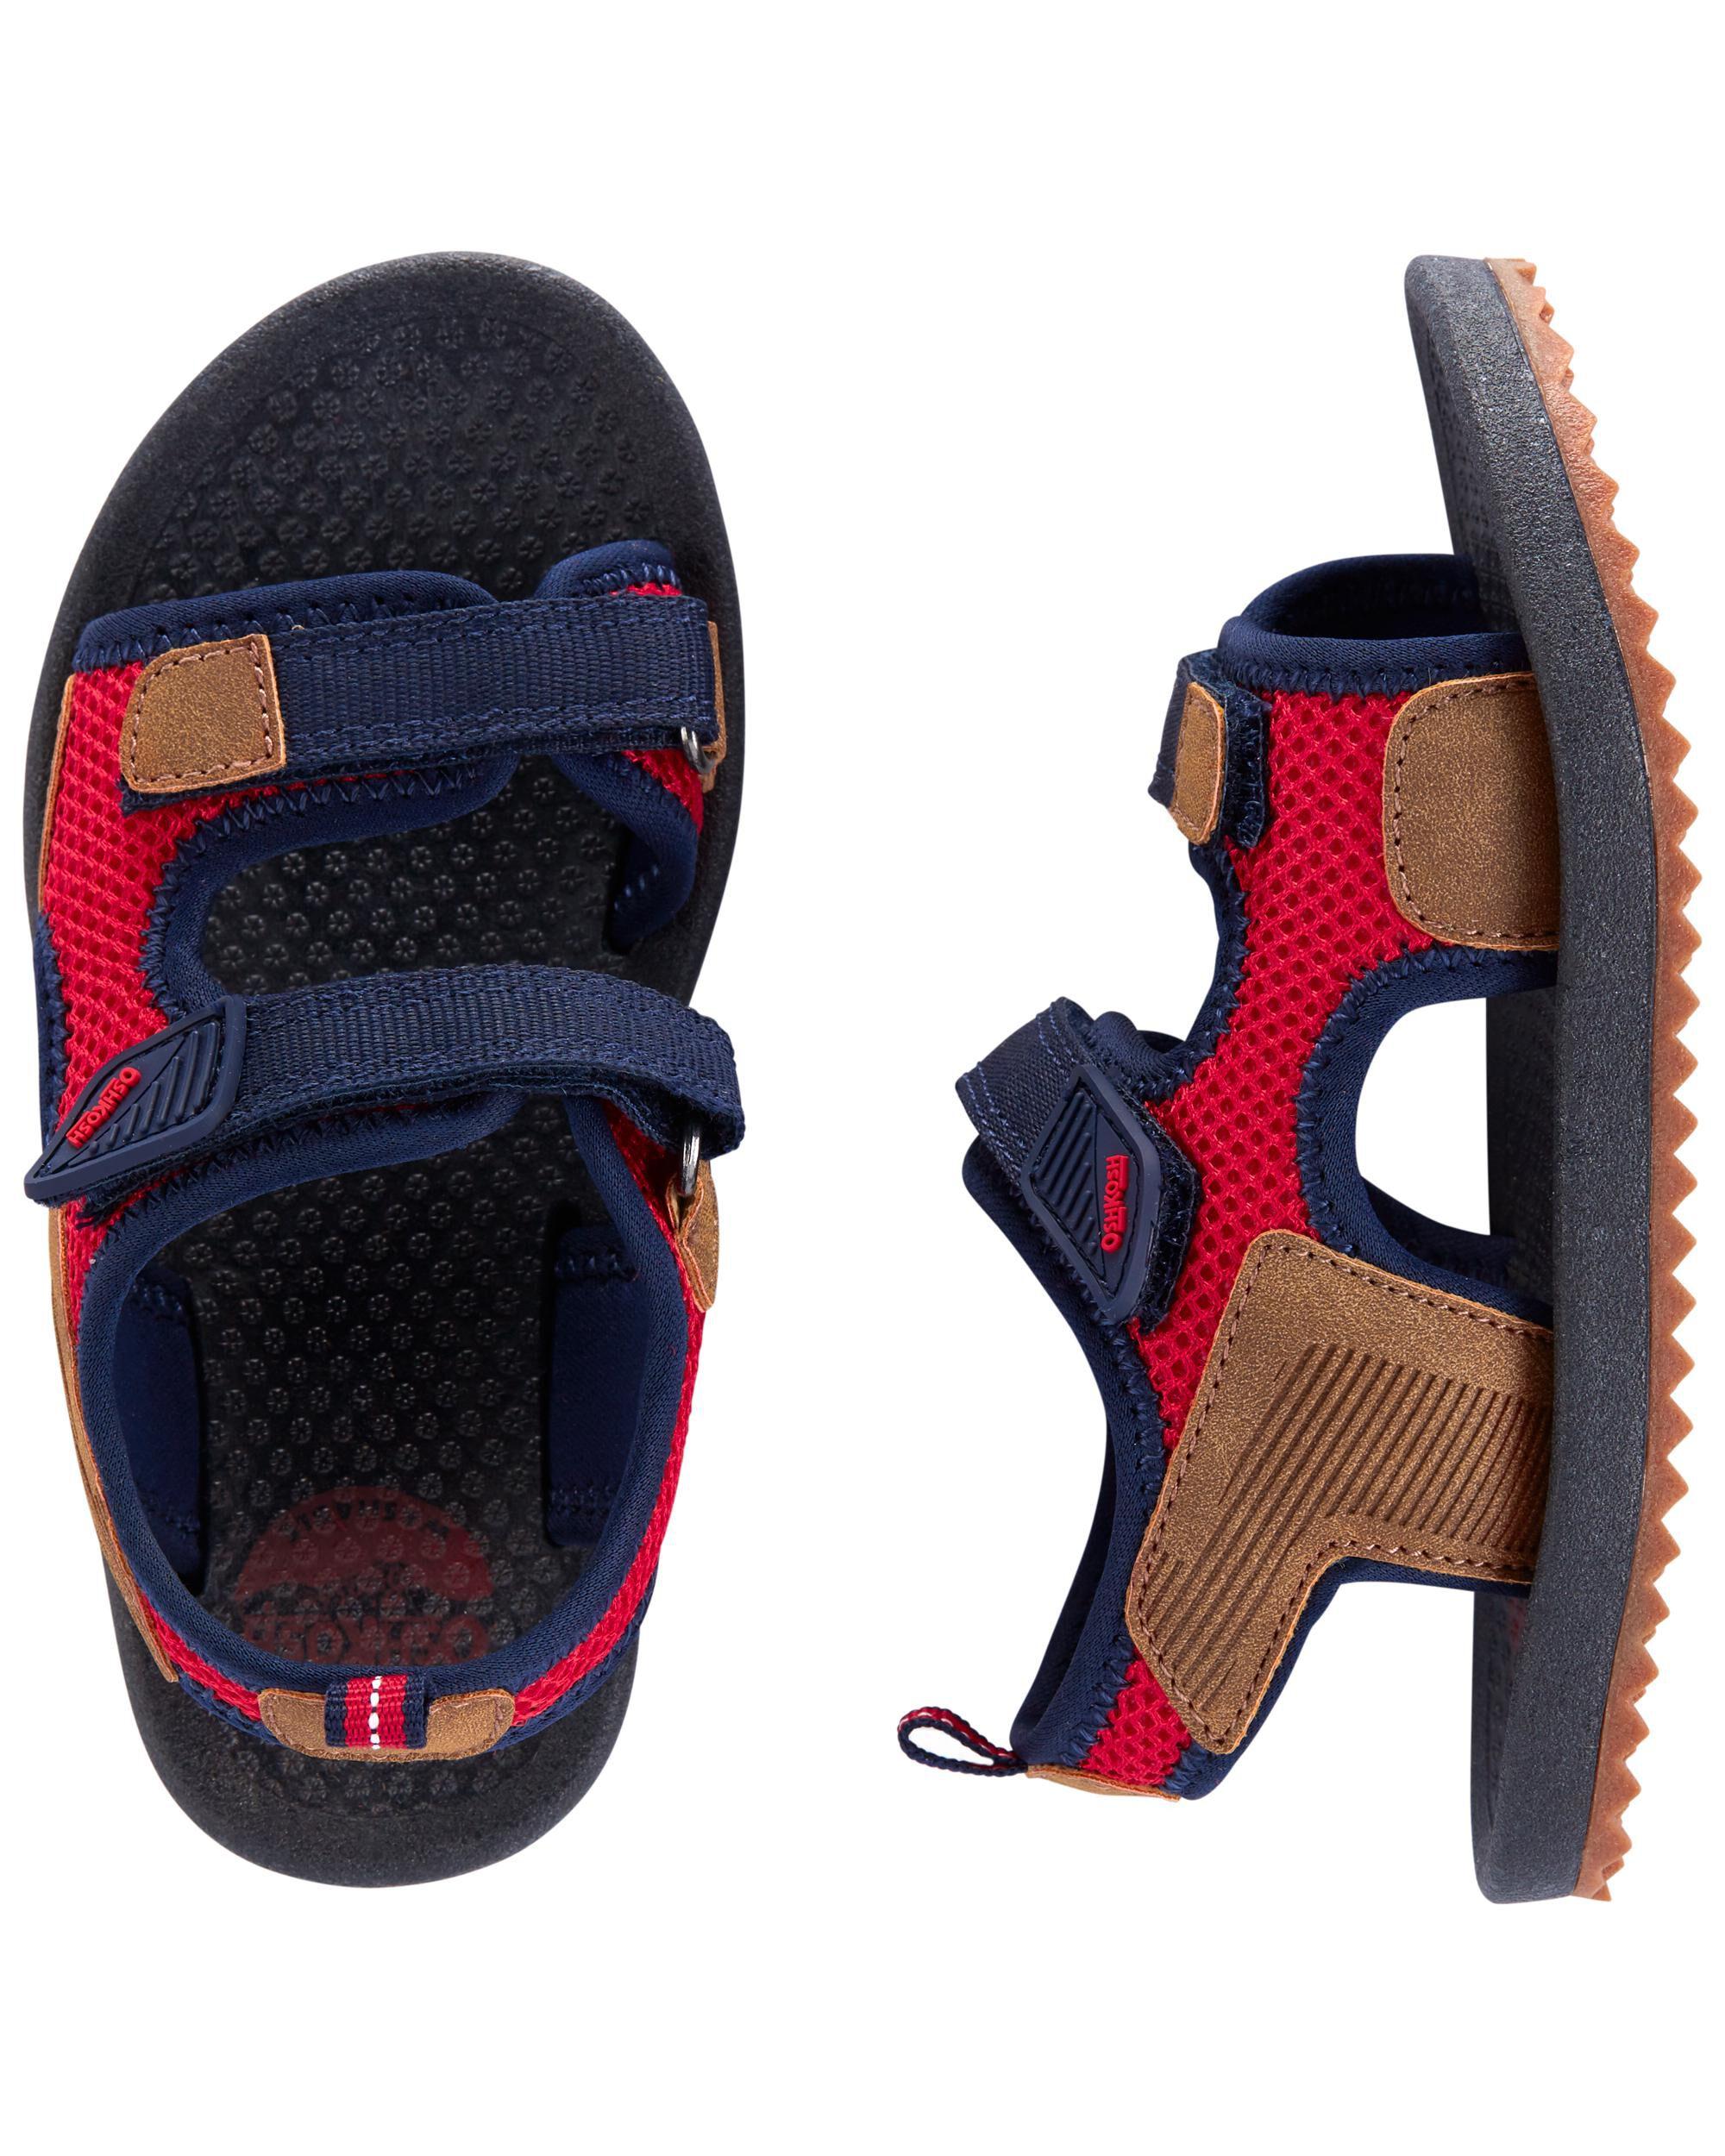 Carters Colorblock Sandals